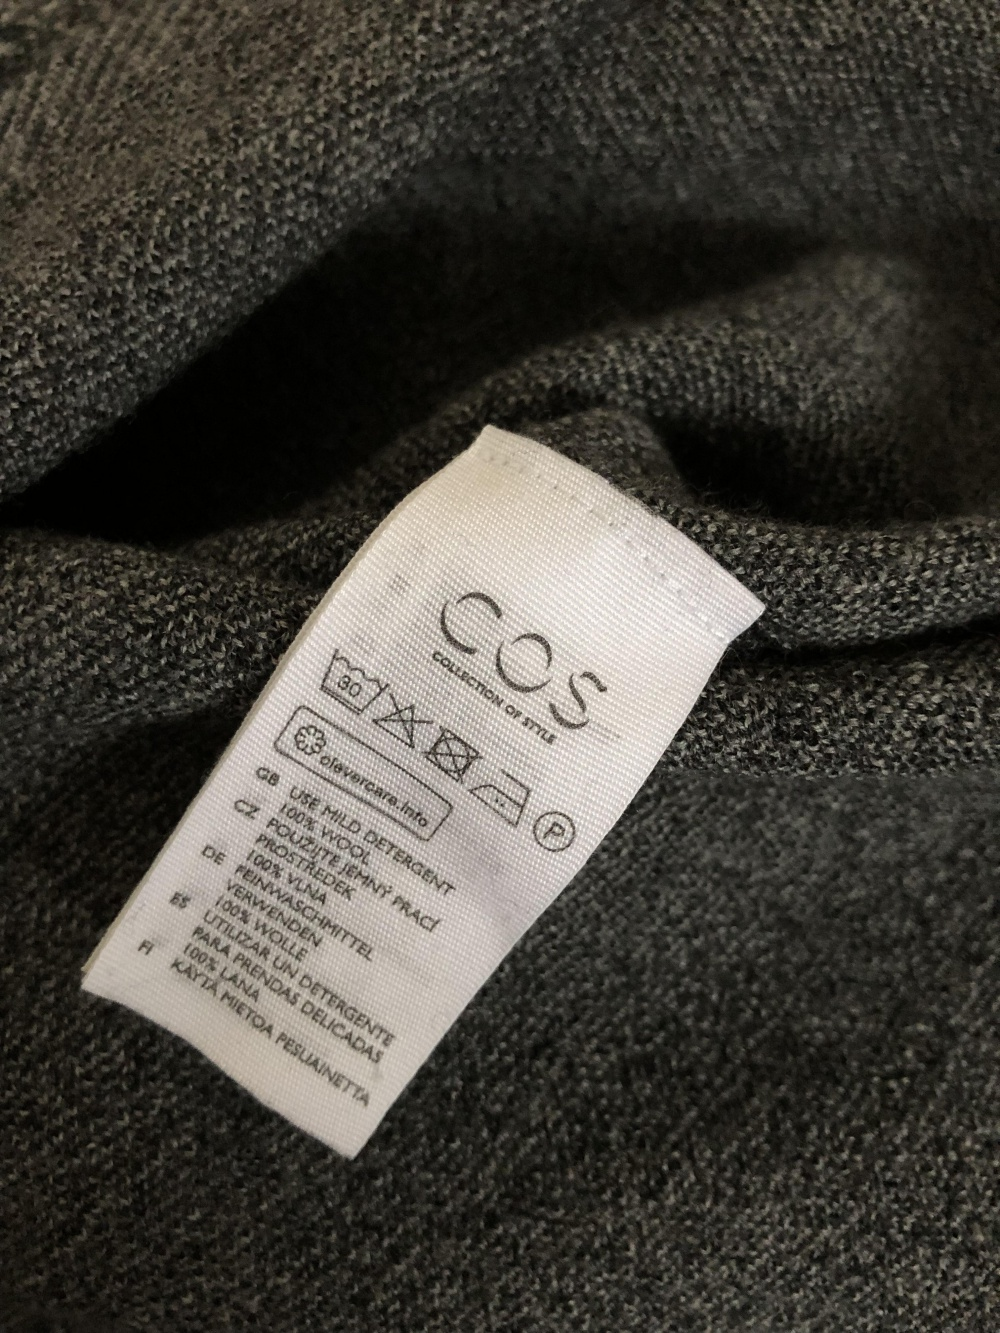 Шерстяное платье COS (S, RUS 42)